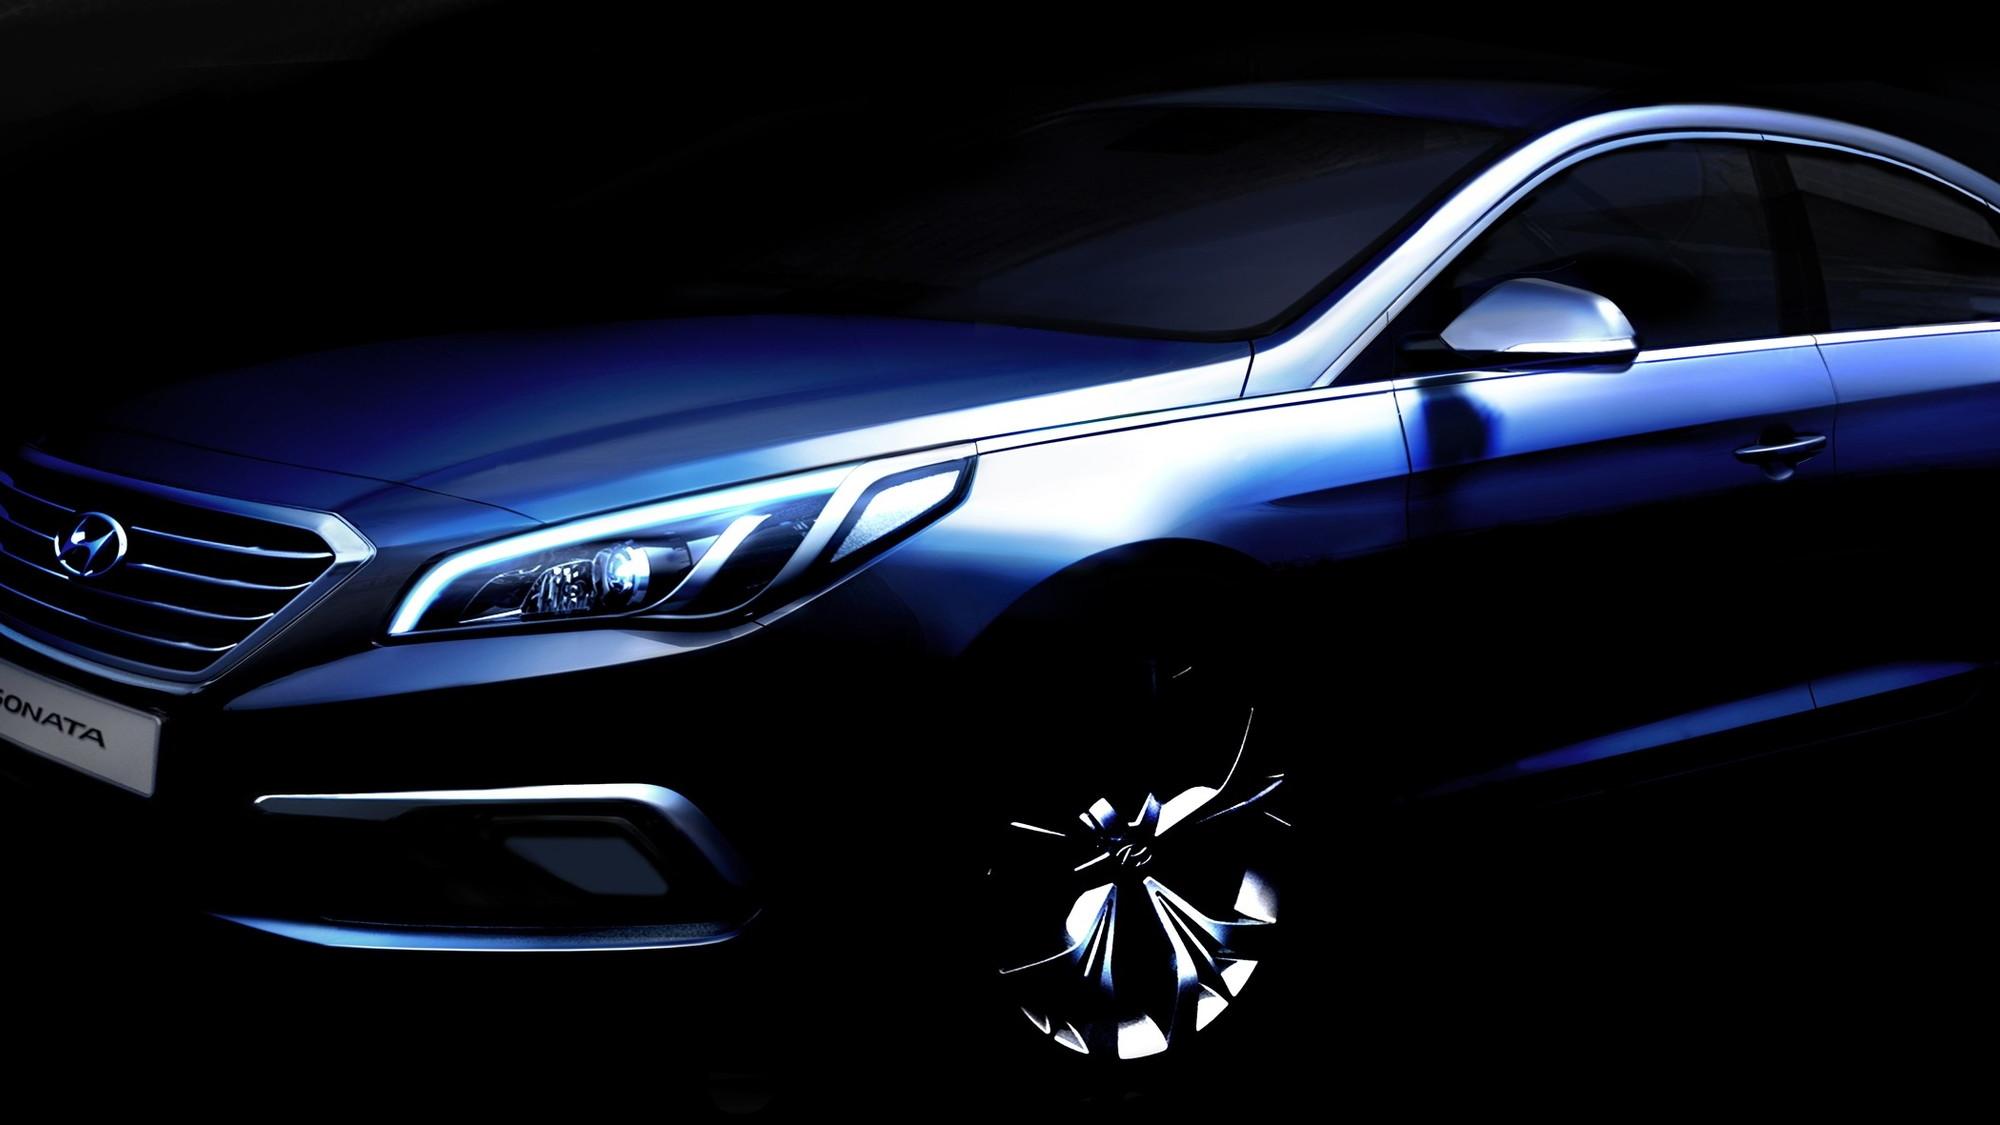 2015 Hyundai Sonata teaser sketch